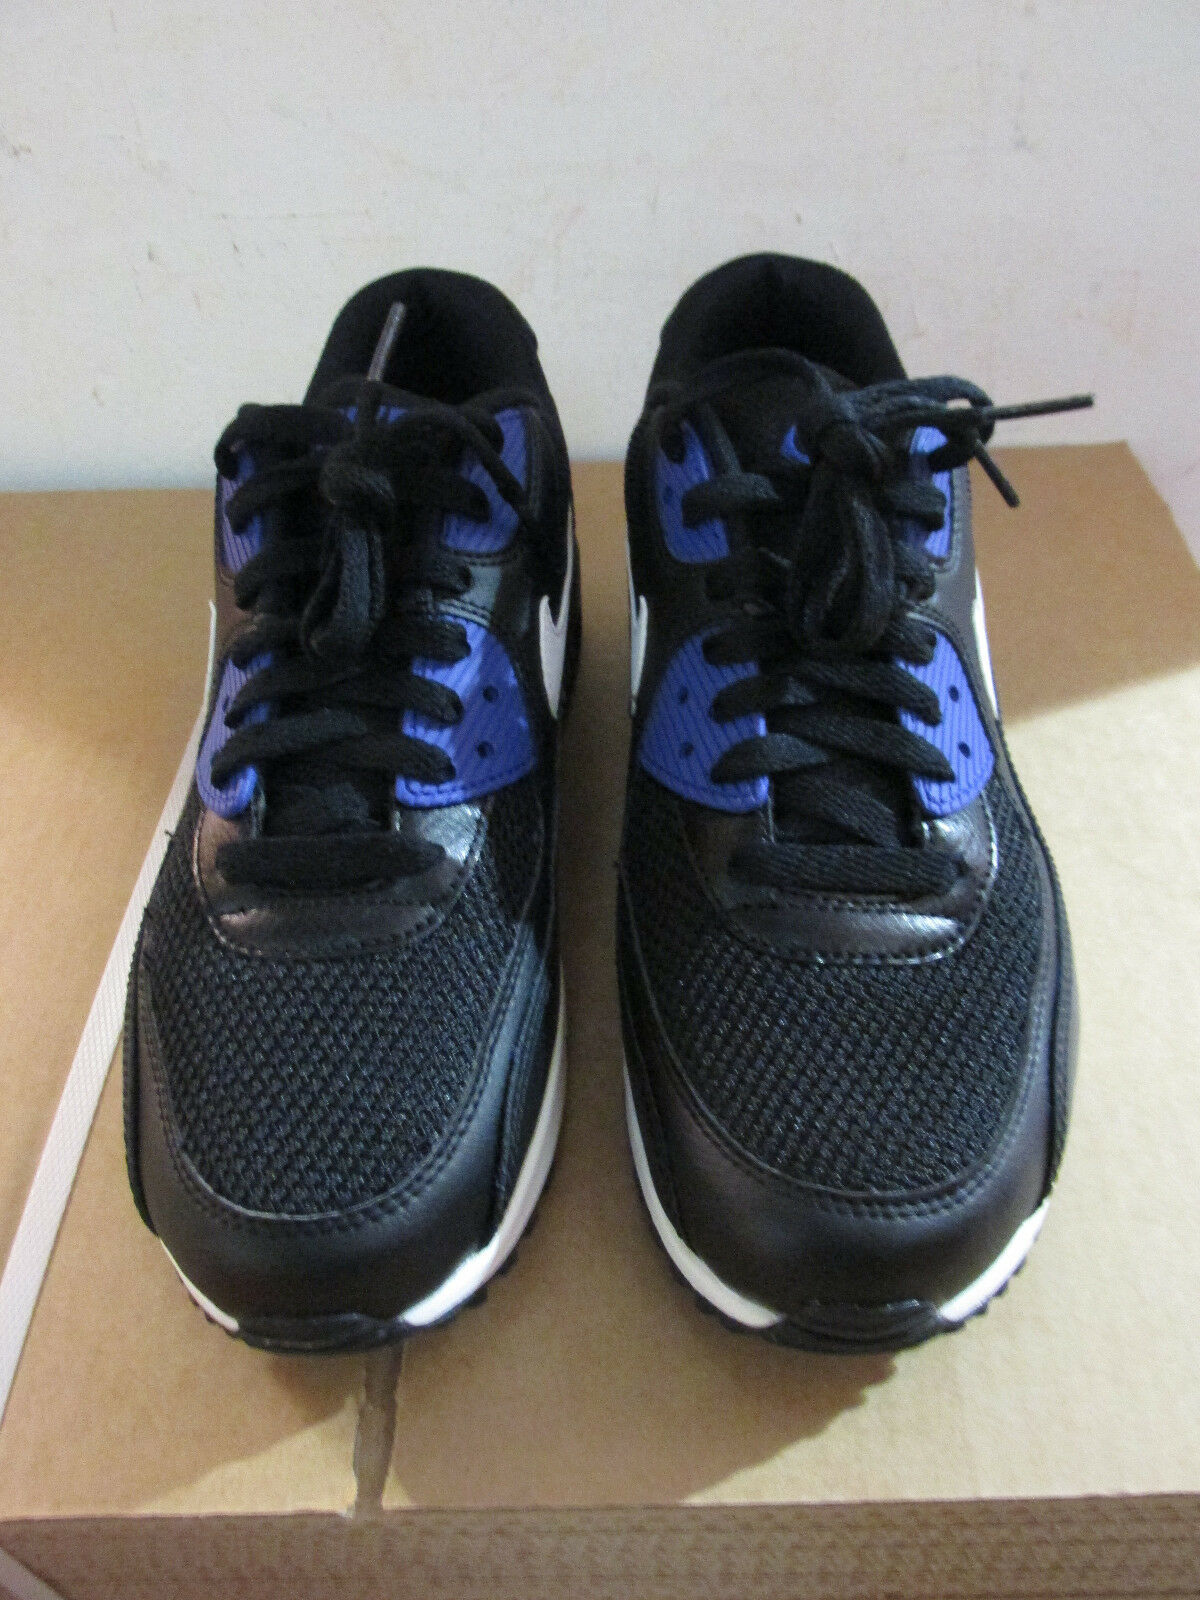 best service caafd 98500 ... Nike Air Max 90 Essentielles Essentielles Essentielles Chaussure de  Course pour Homme 537384 052 Baskets 7dc3ef ...